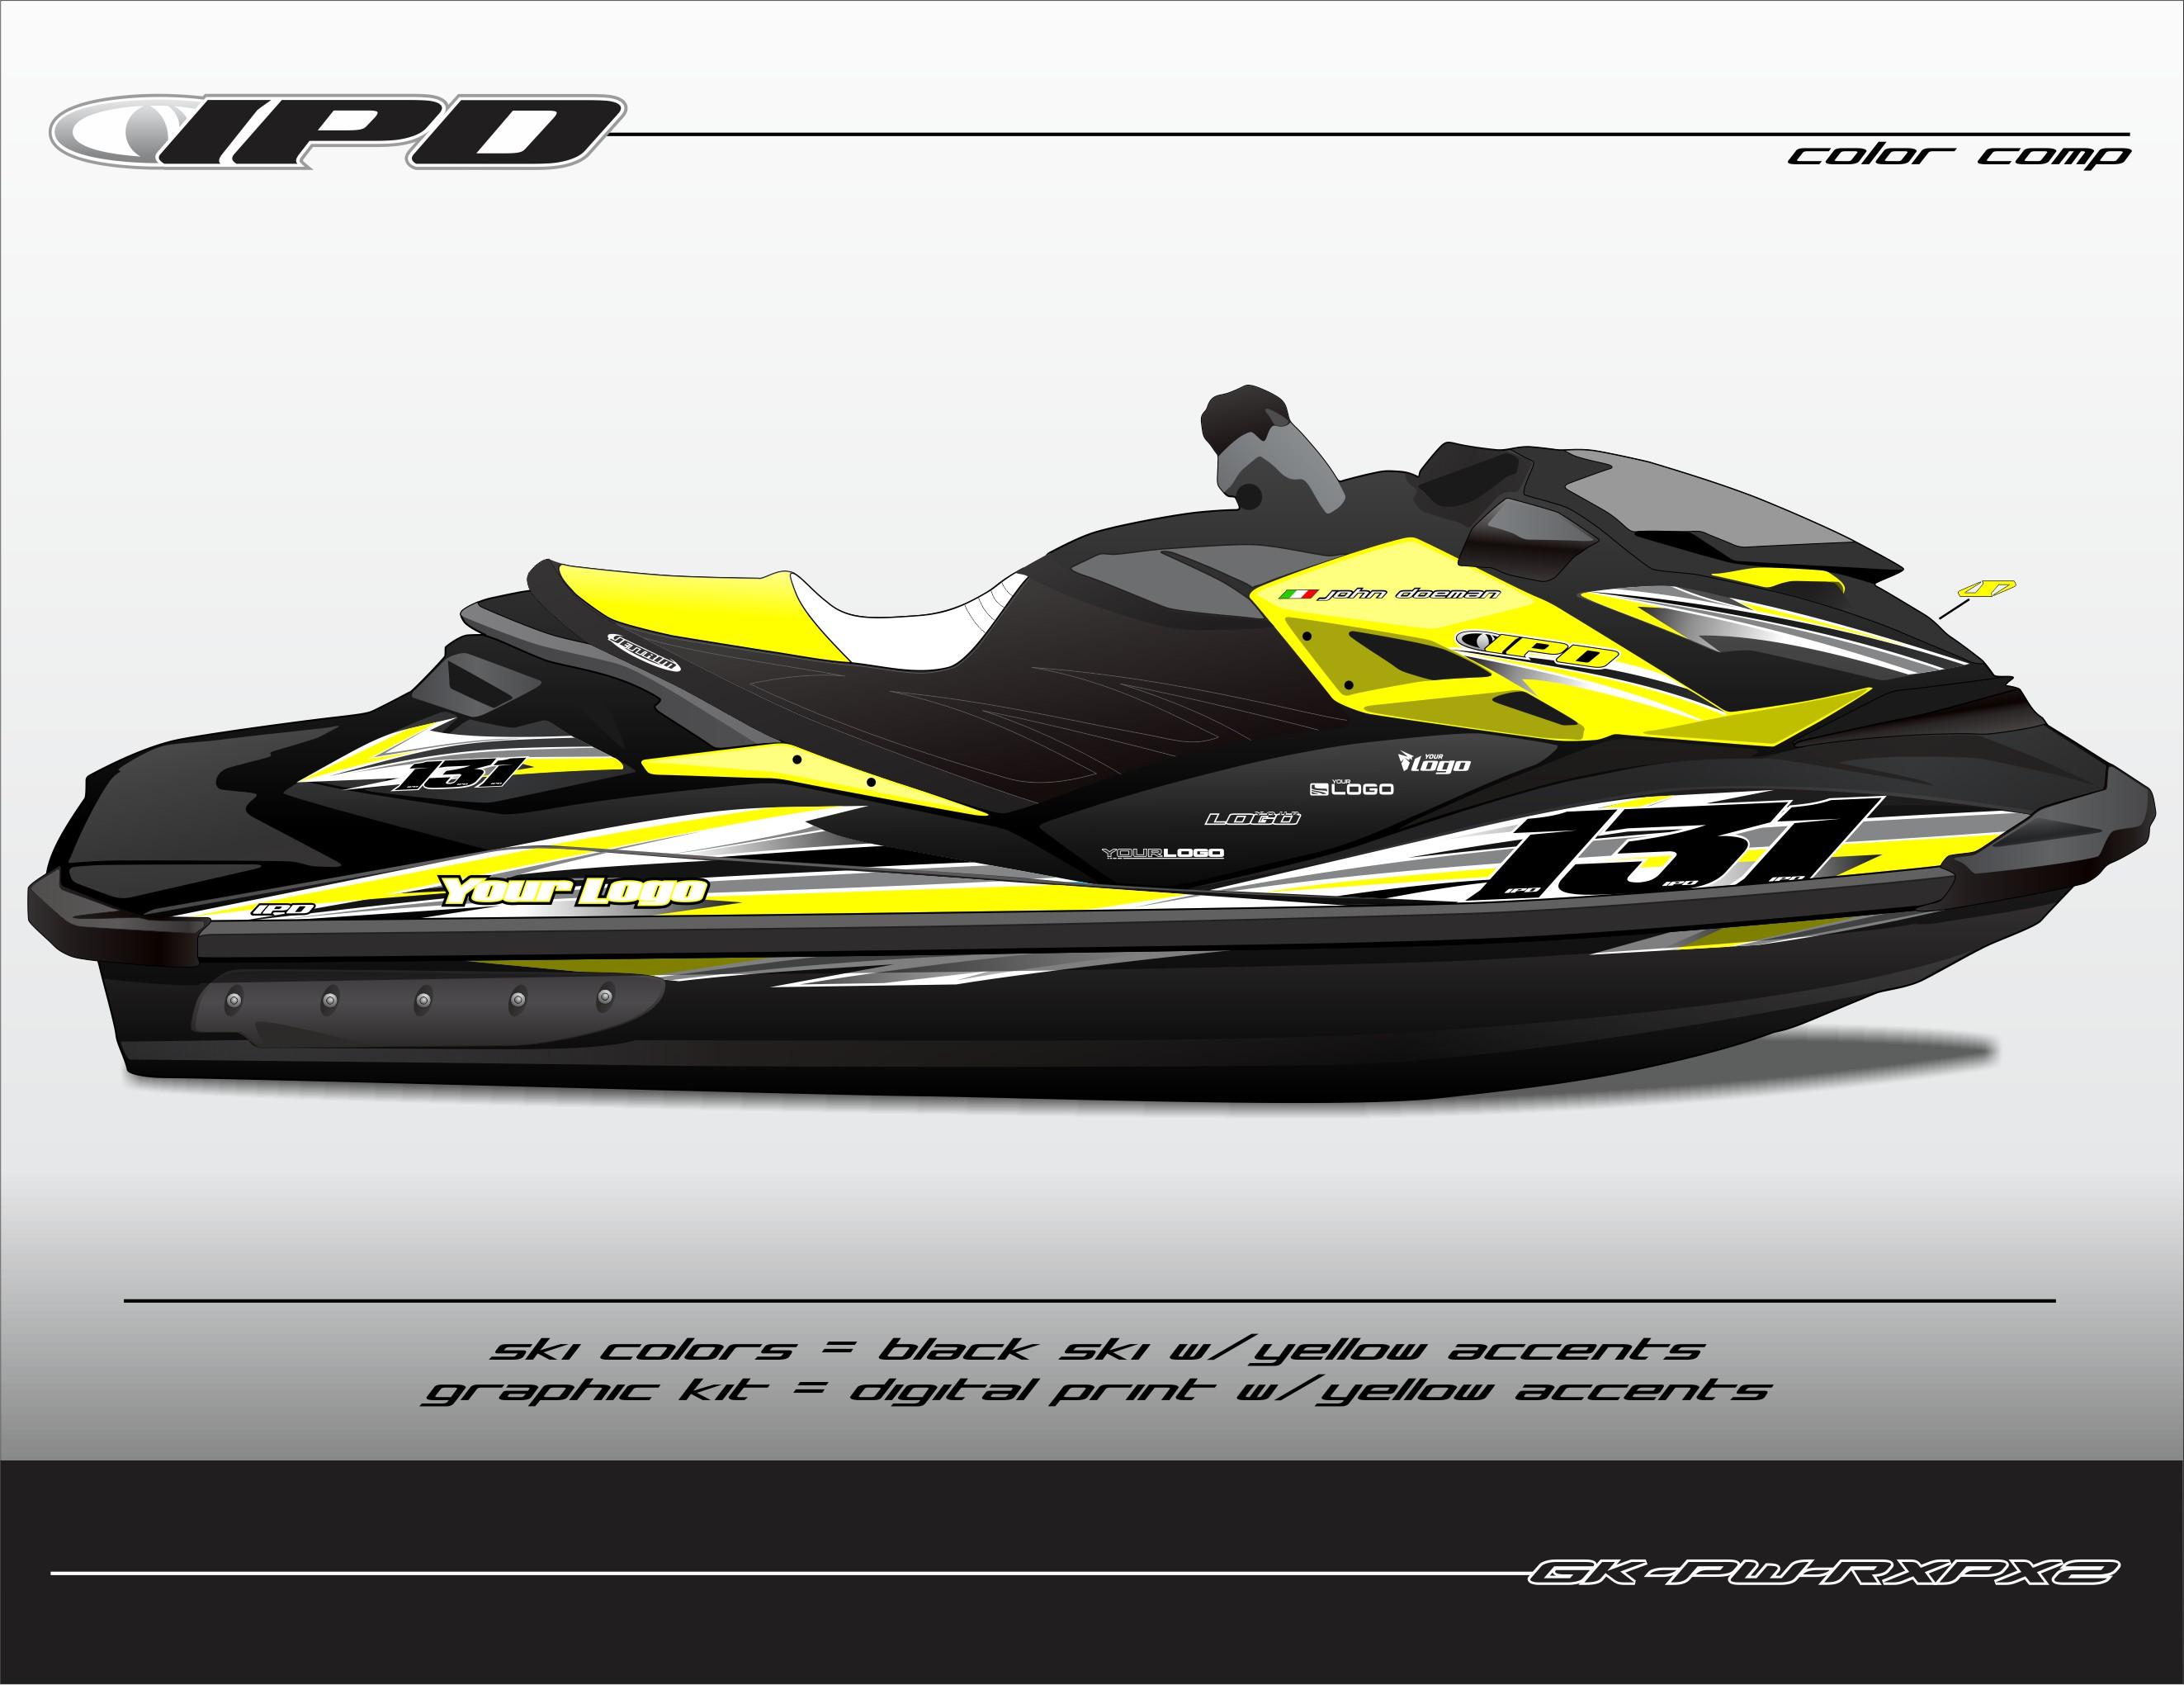 GK-PW-RXPX2 (Yellow Accents on Black Ski)